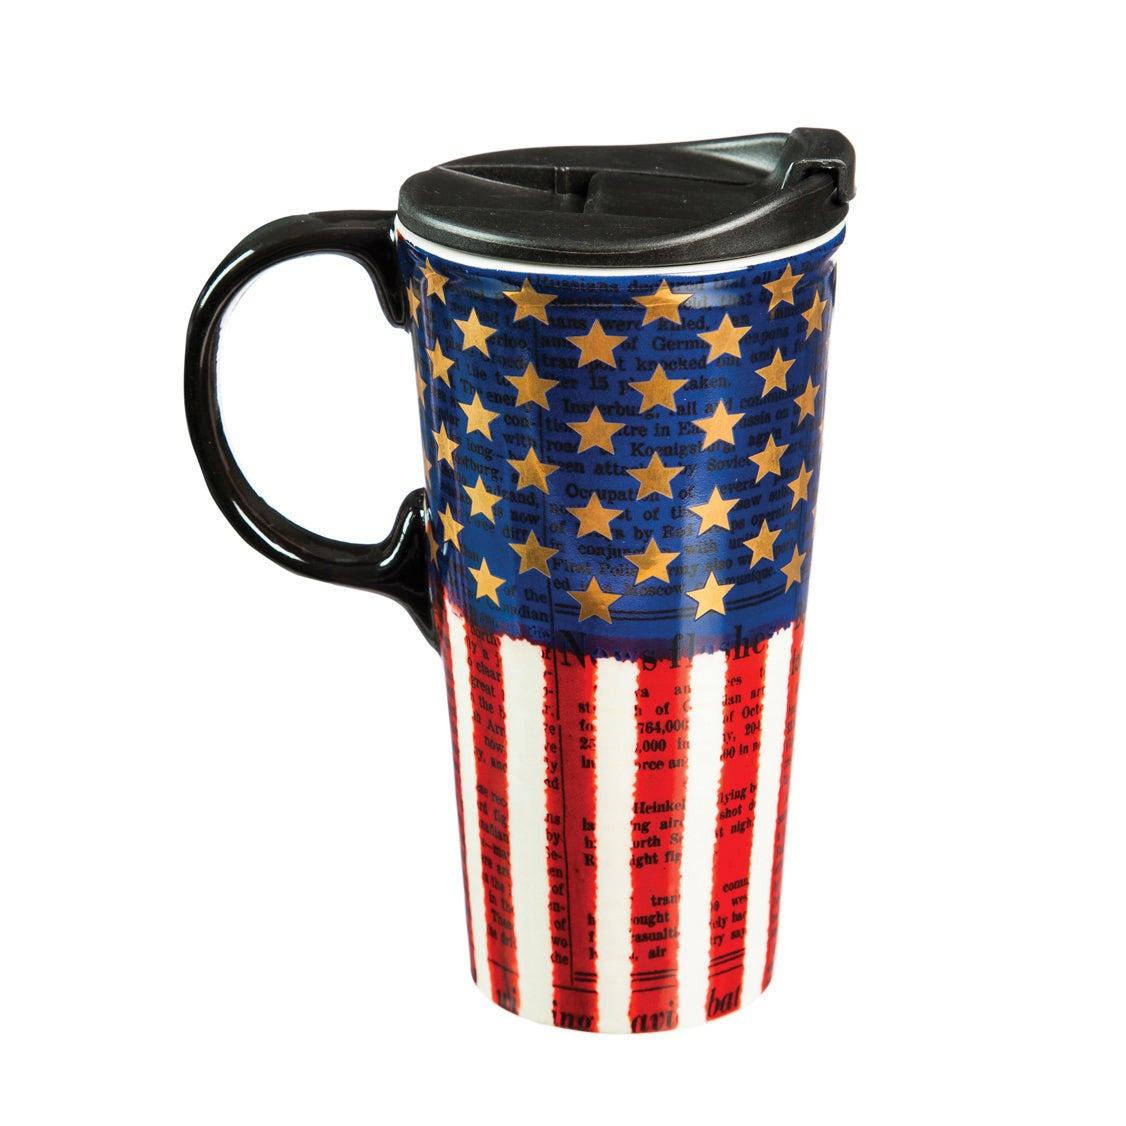 Americana Metallic Ceramic Travel Coffee Cup